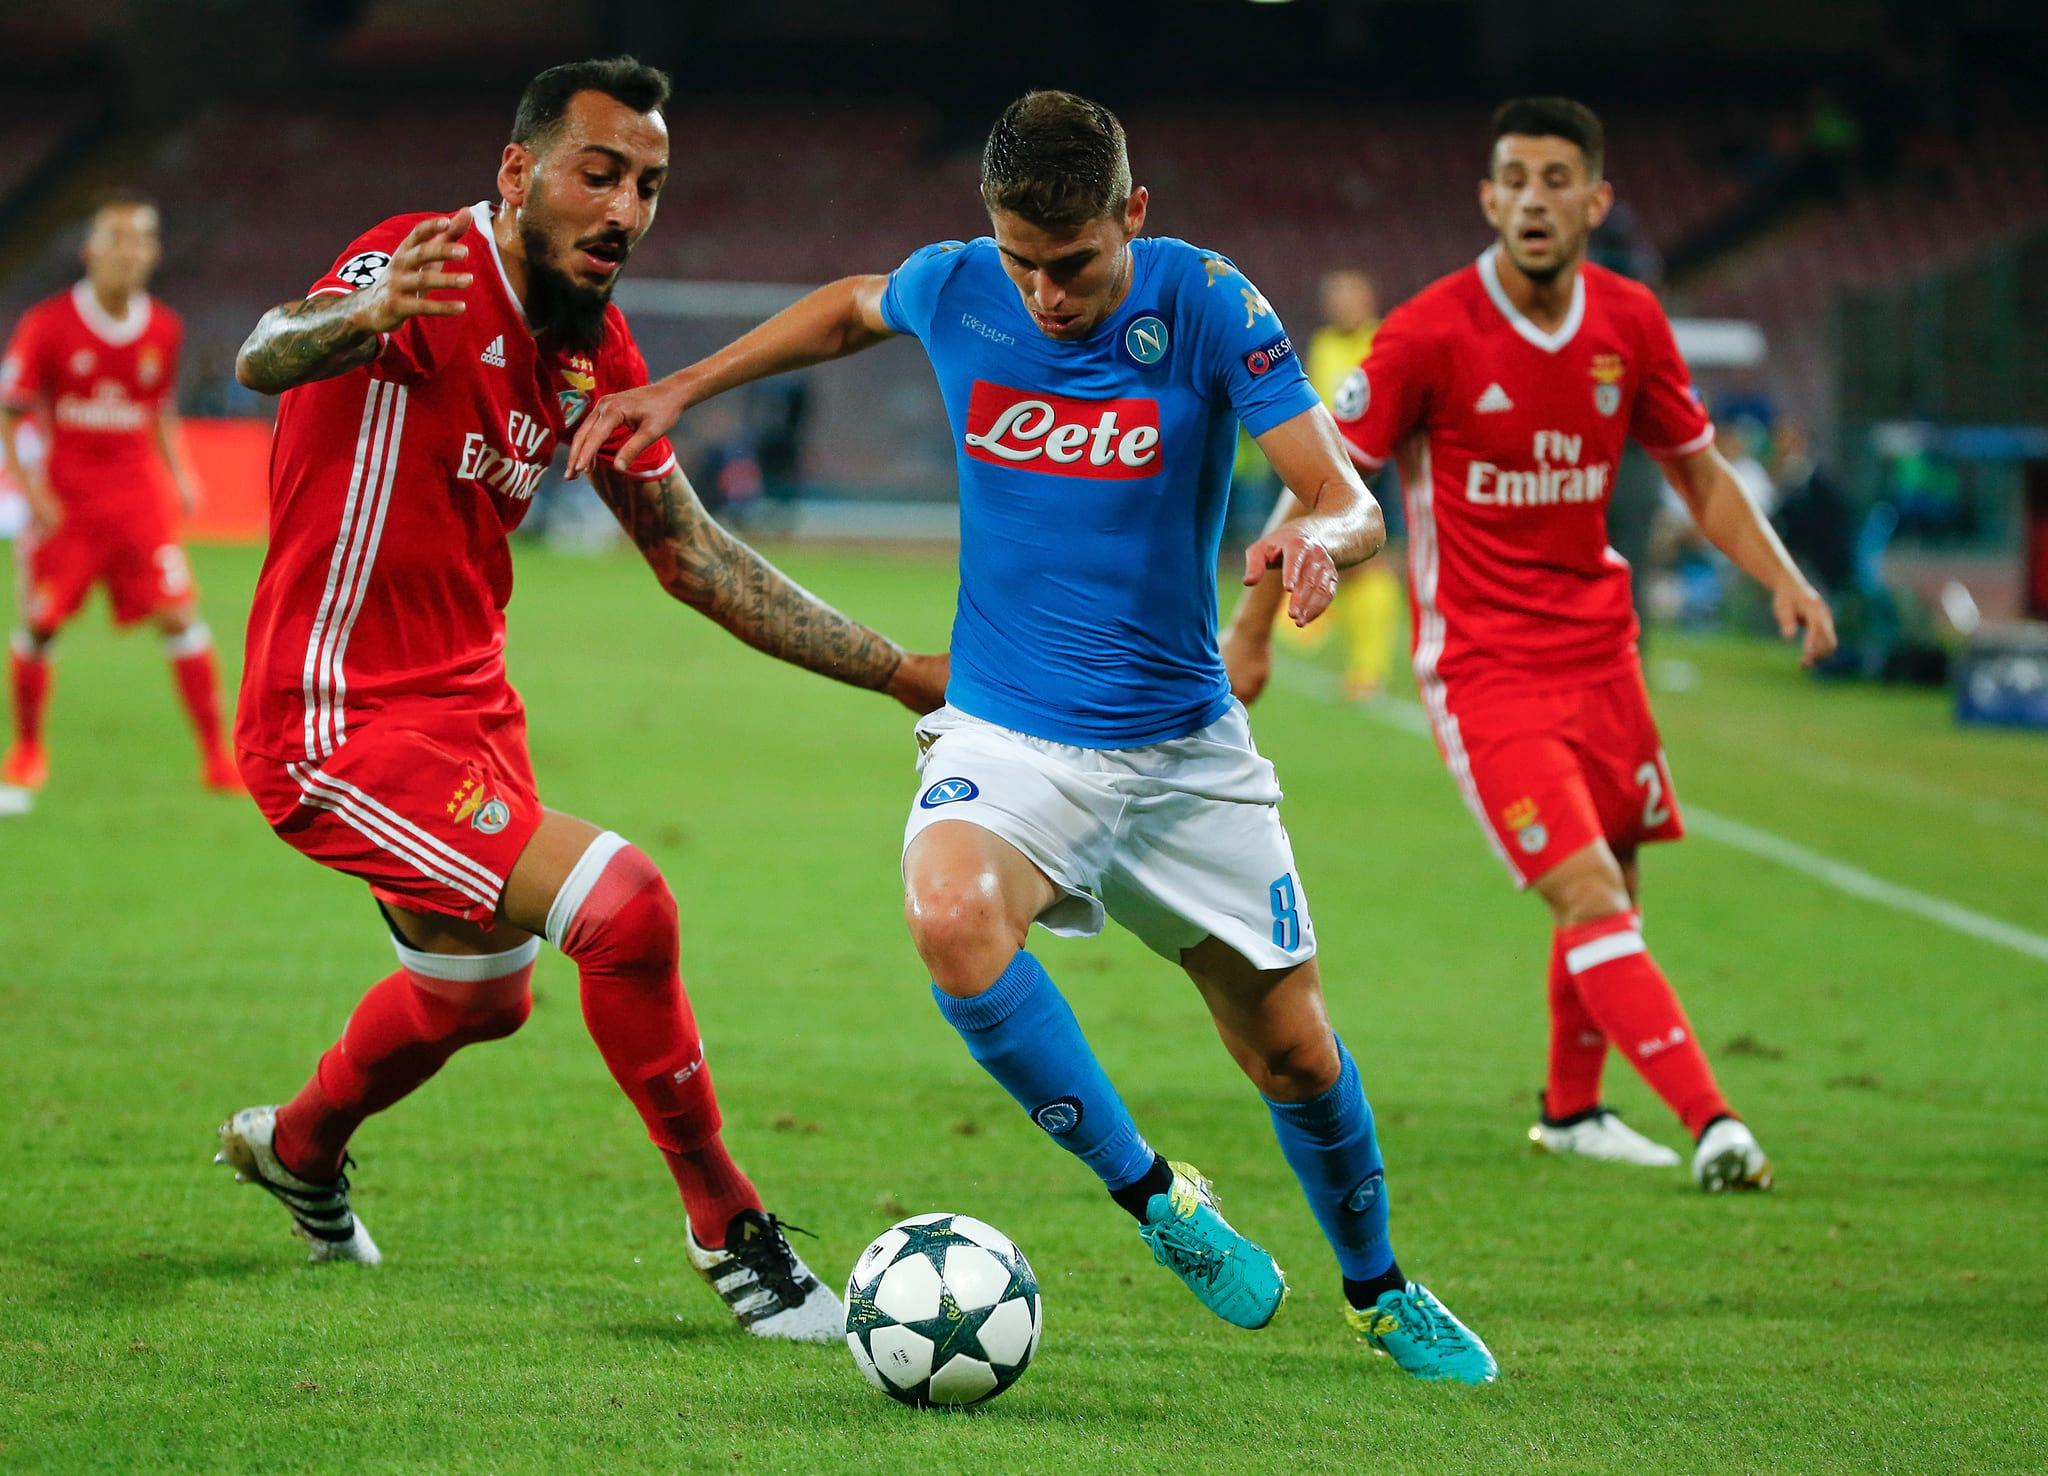 PÚBLICO - Benfica-Nápoles: confrontos entre adeptos antes do jogo